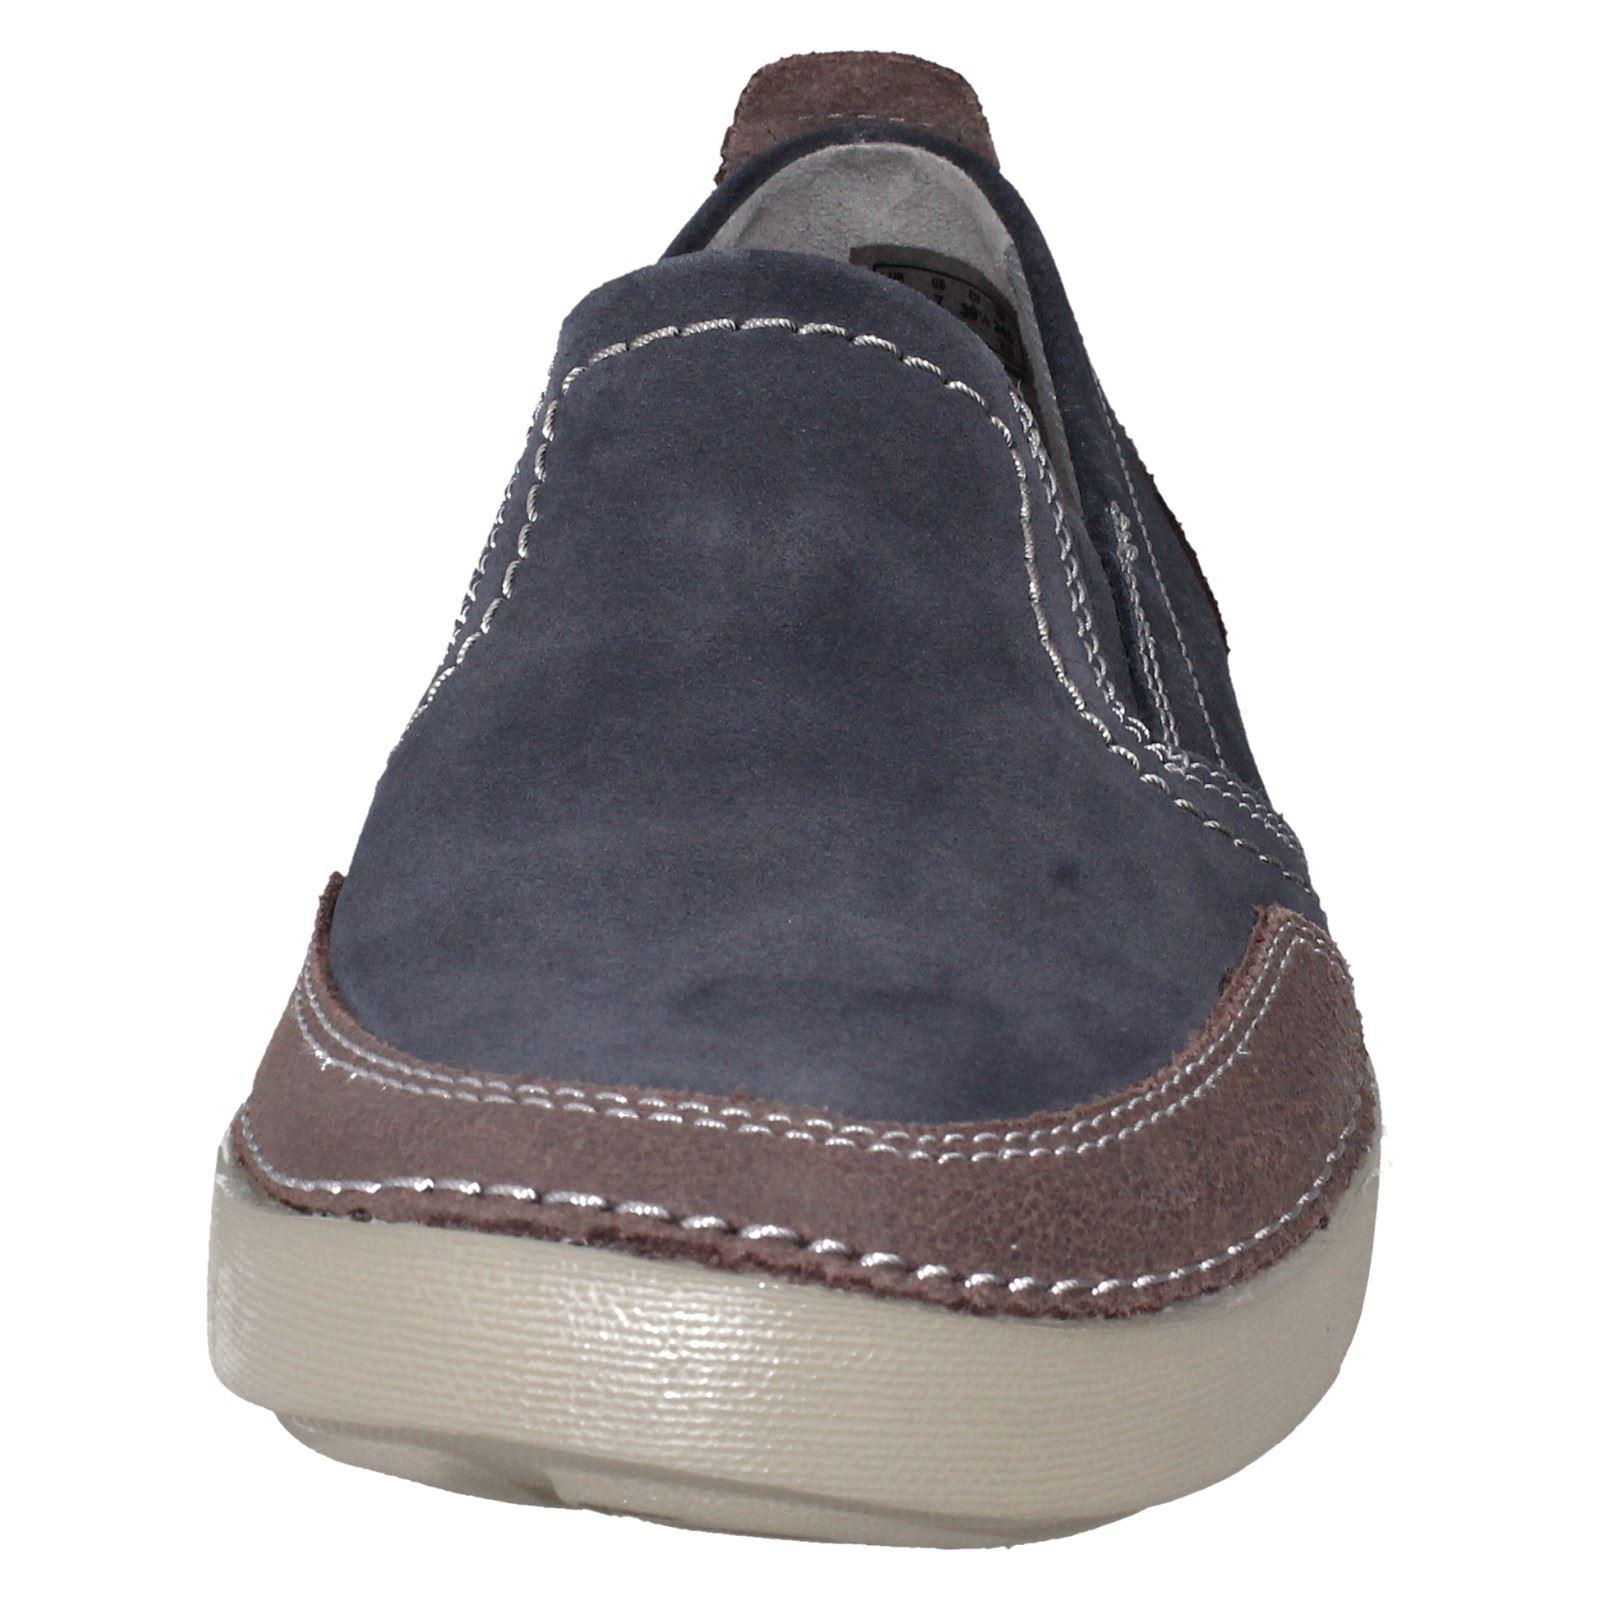 Men's Casual Slip On Lightweight Shoes Label -Gosler Race